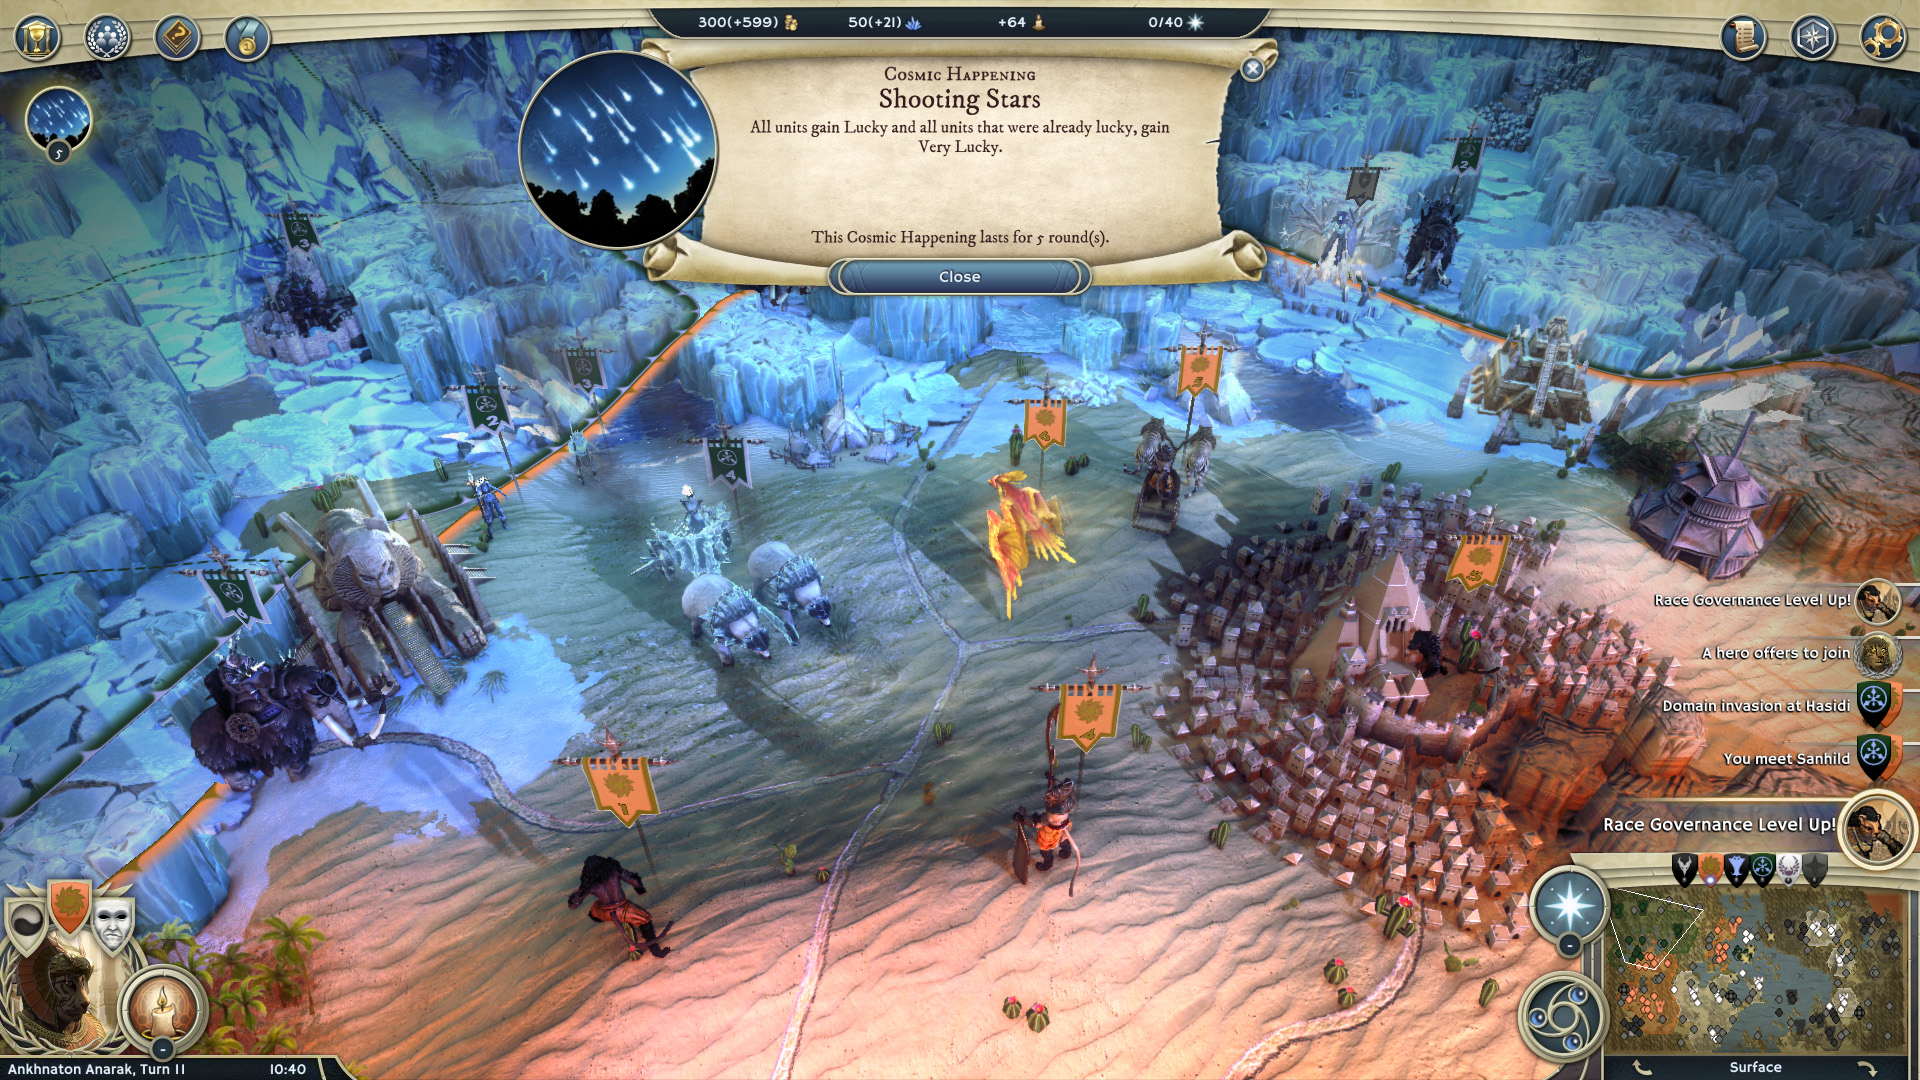 stategy_rpg_age_of_wonders_3_eternal_lords_expansion_cosmic_happening_screenshot